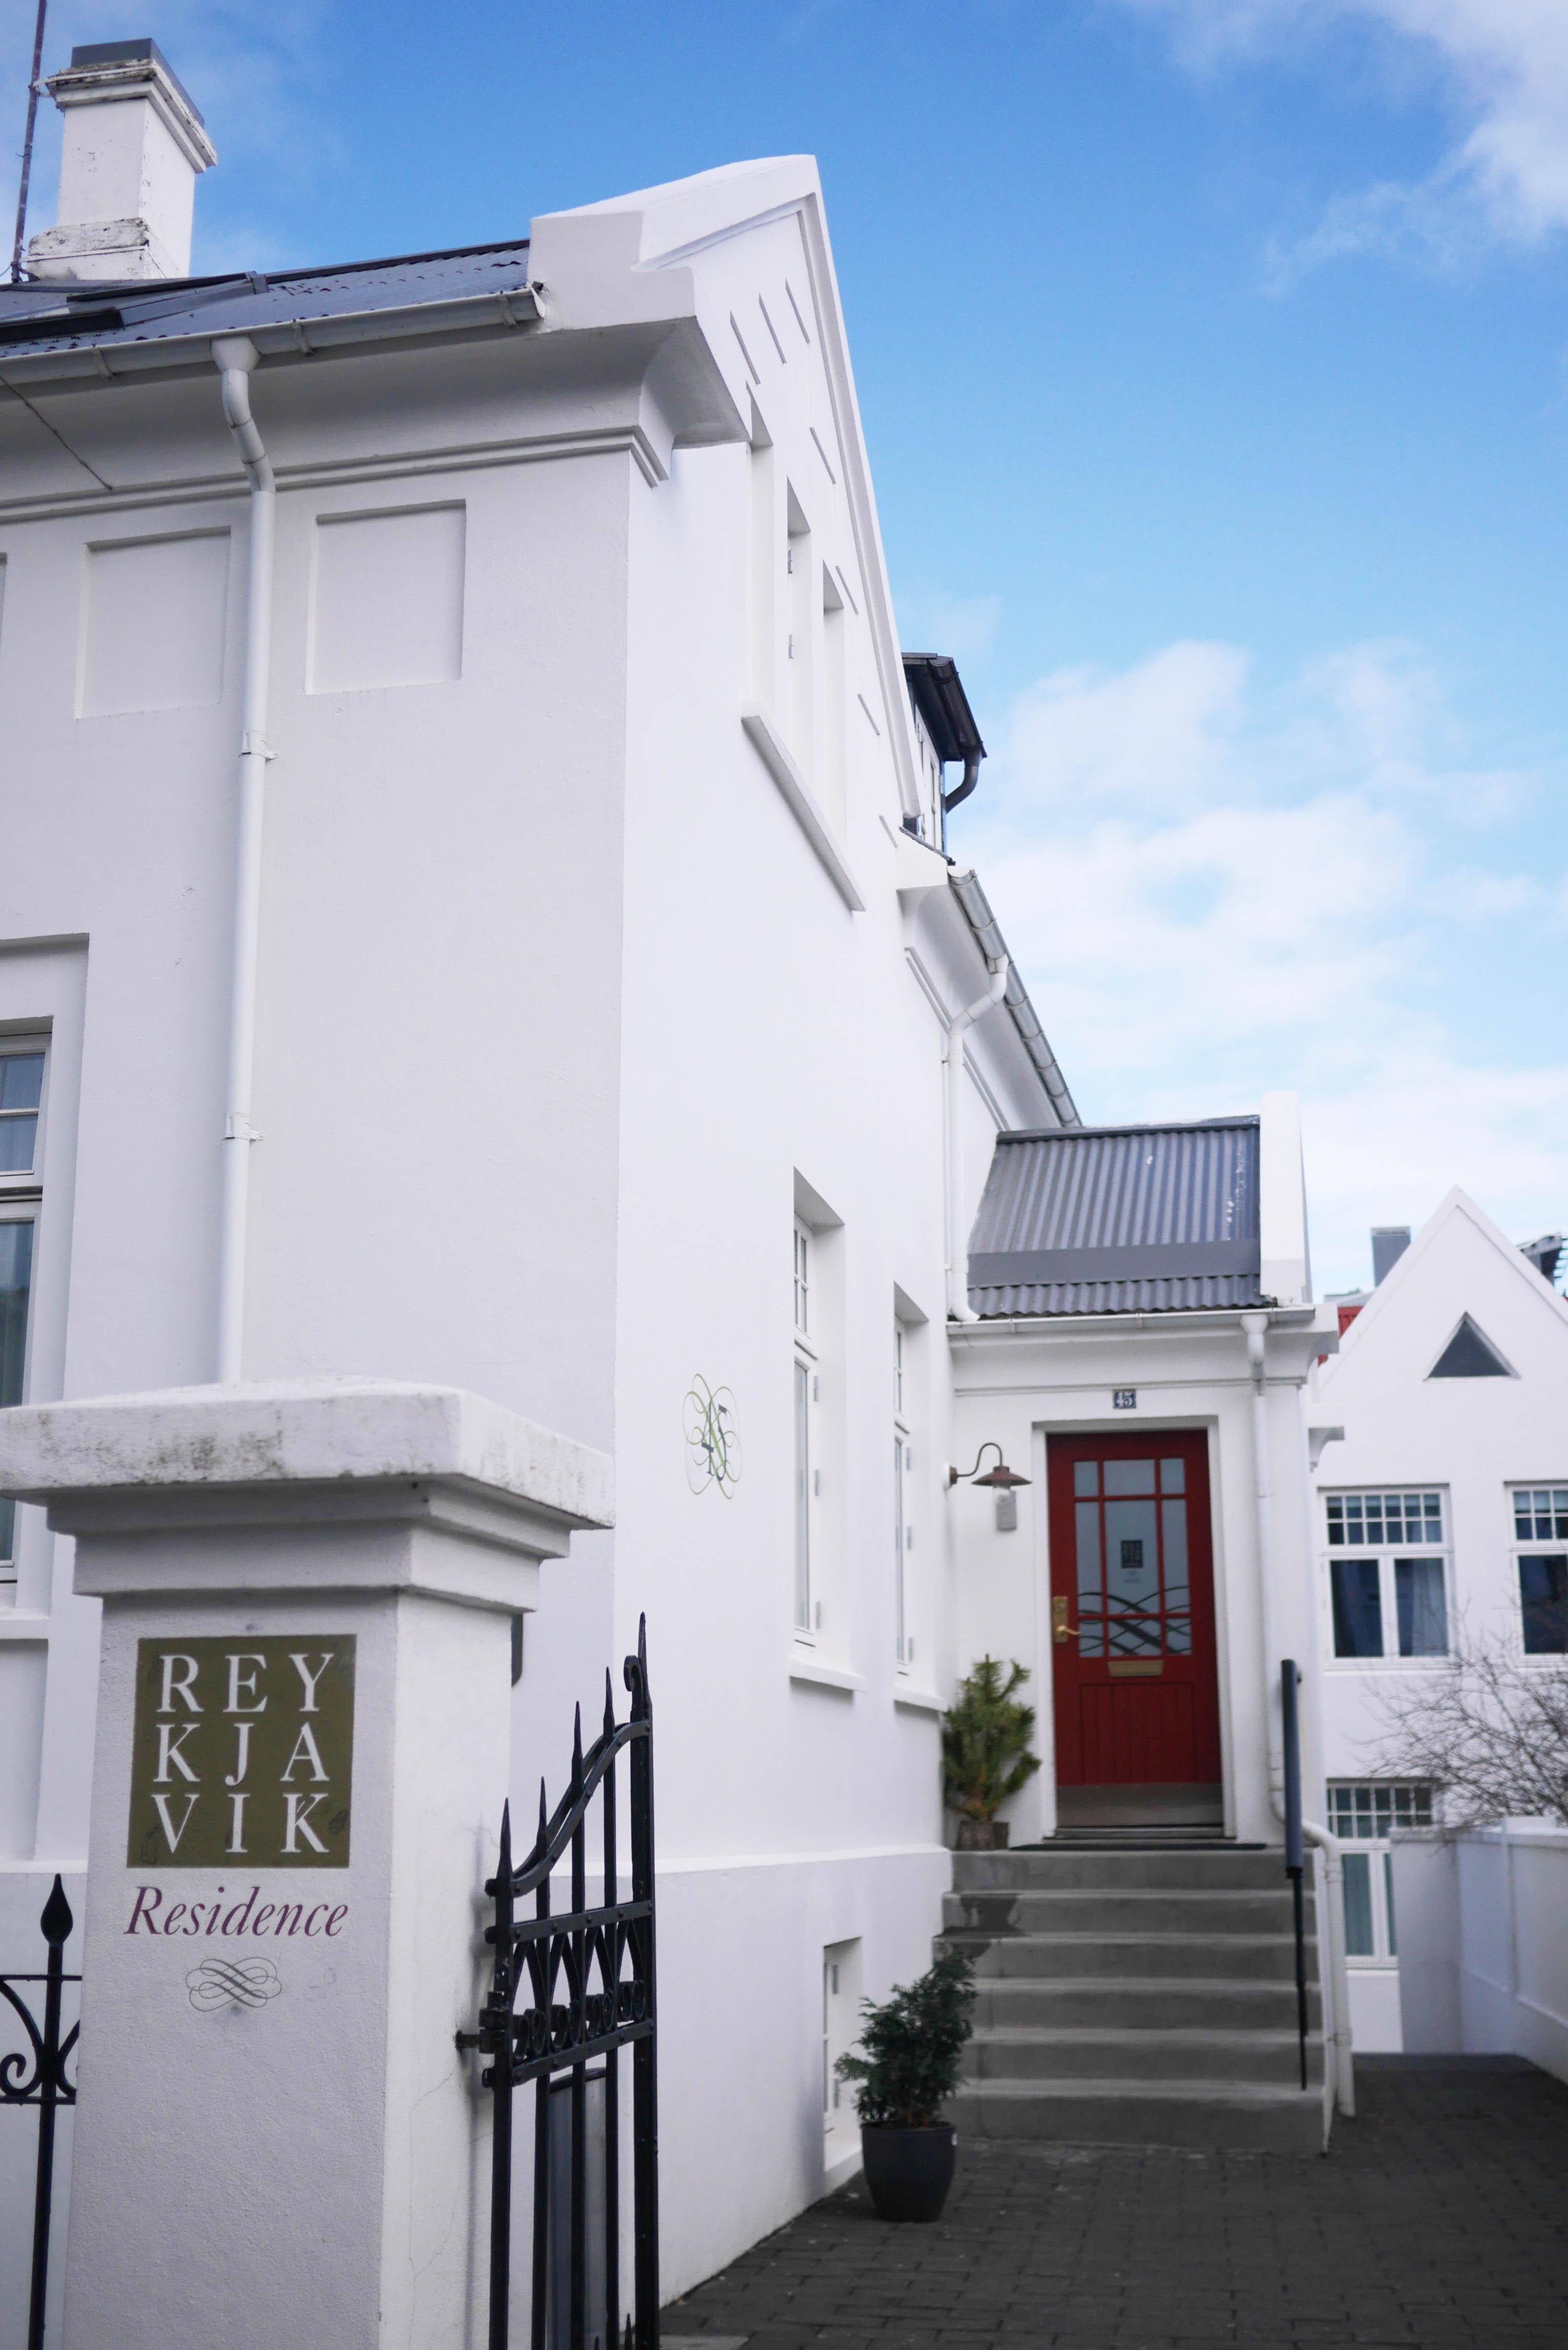 Reykjavik-Residence-Suites-22